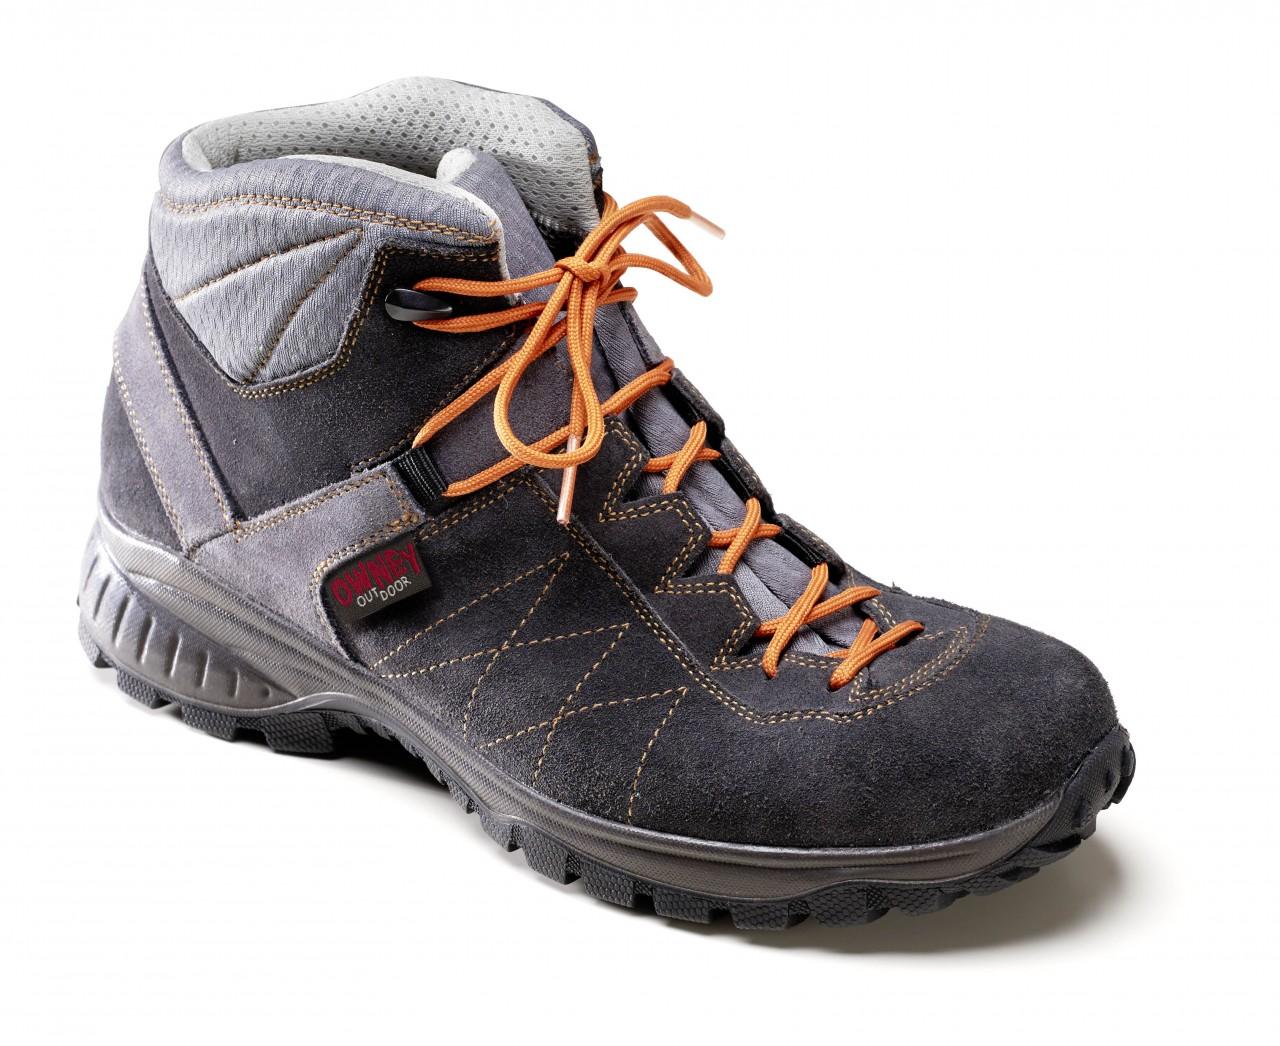 Schuhe 'Balto high'